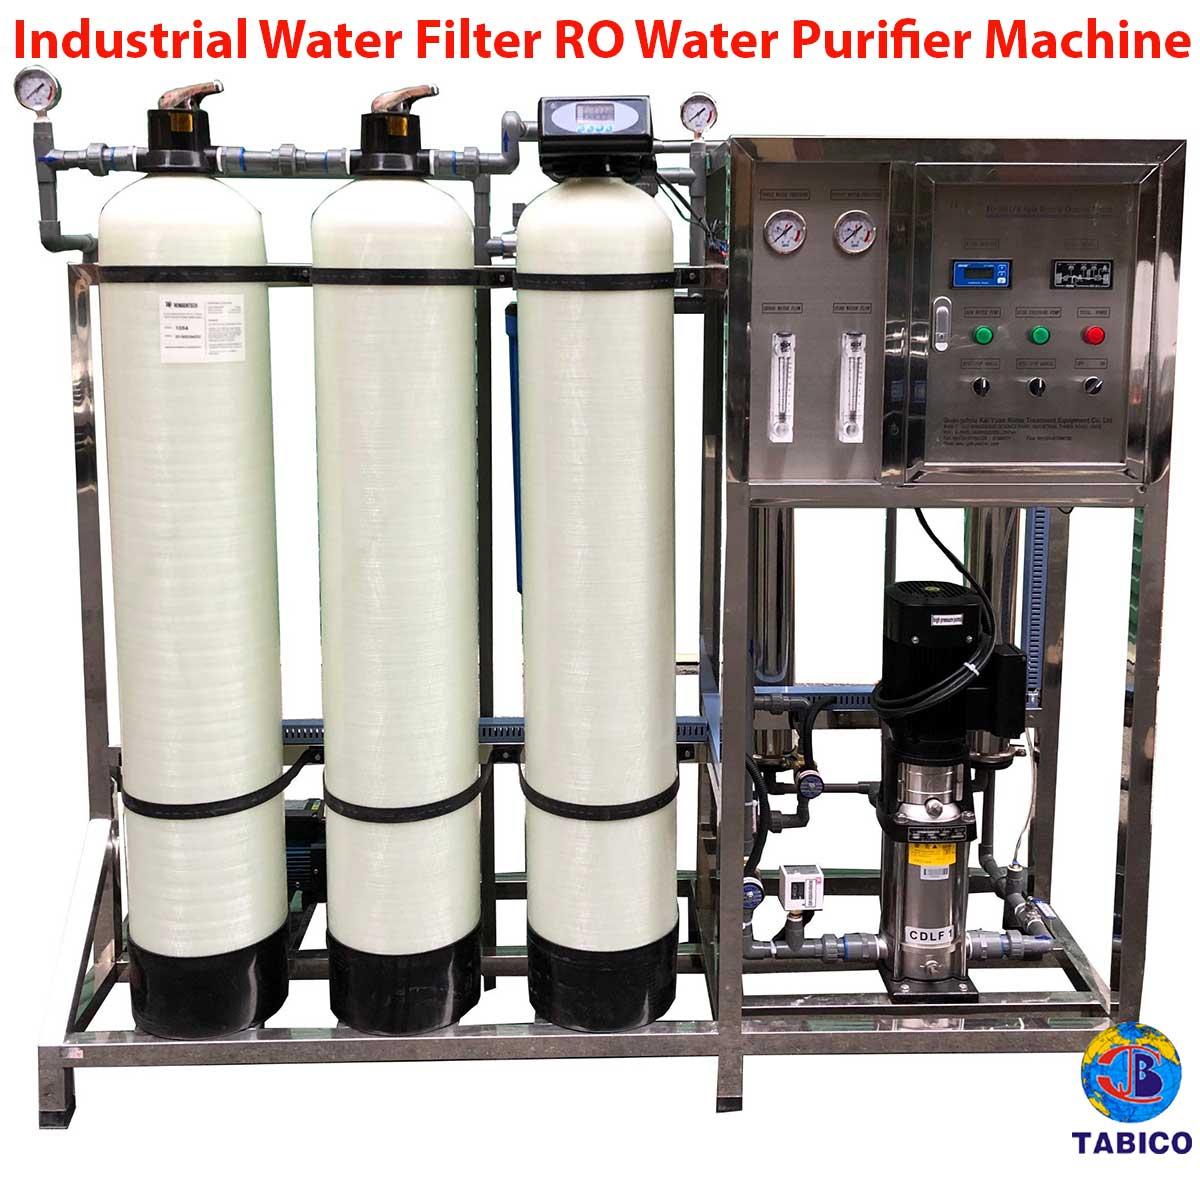 Industrial-Water-Filter-RO-Water-Purifier-Machine